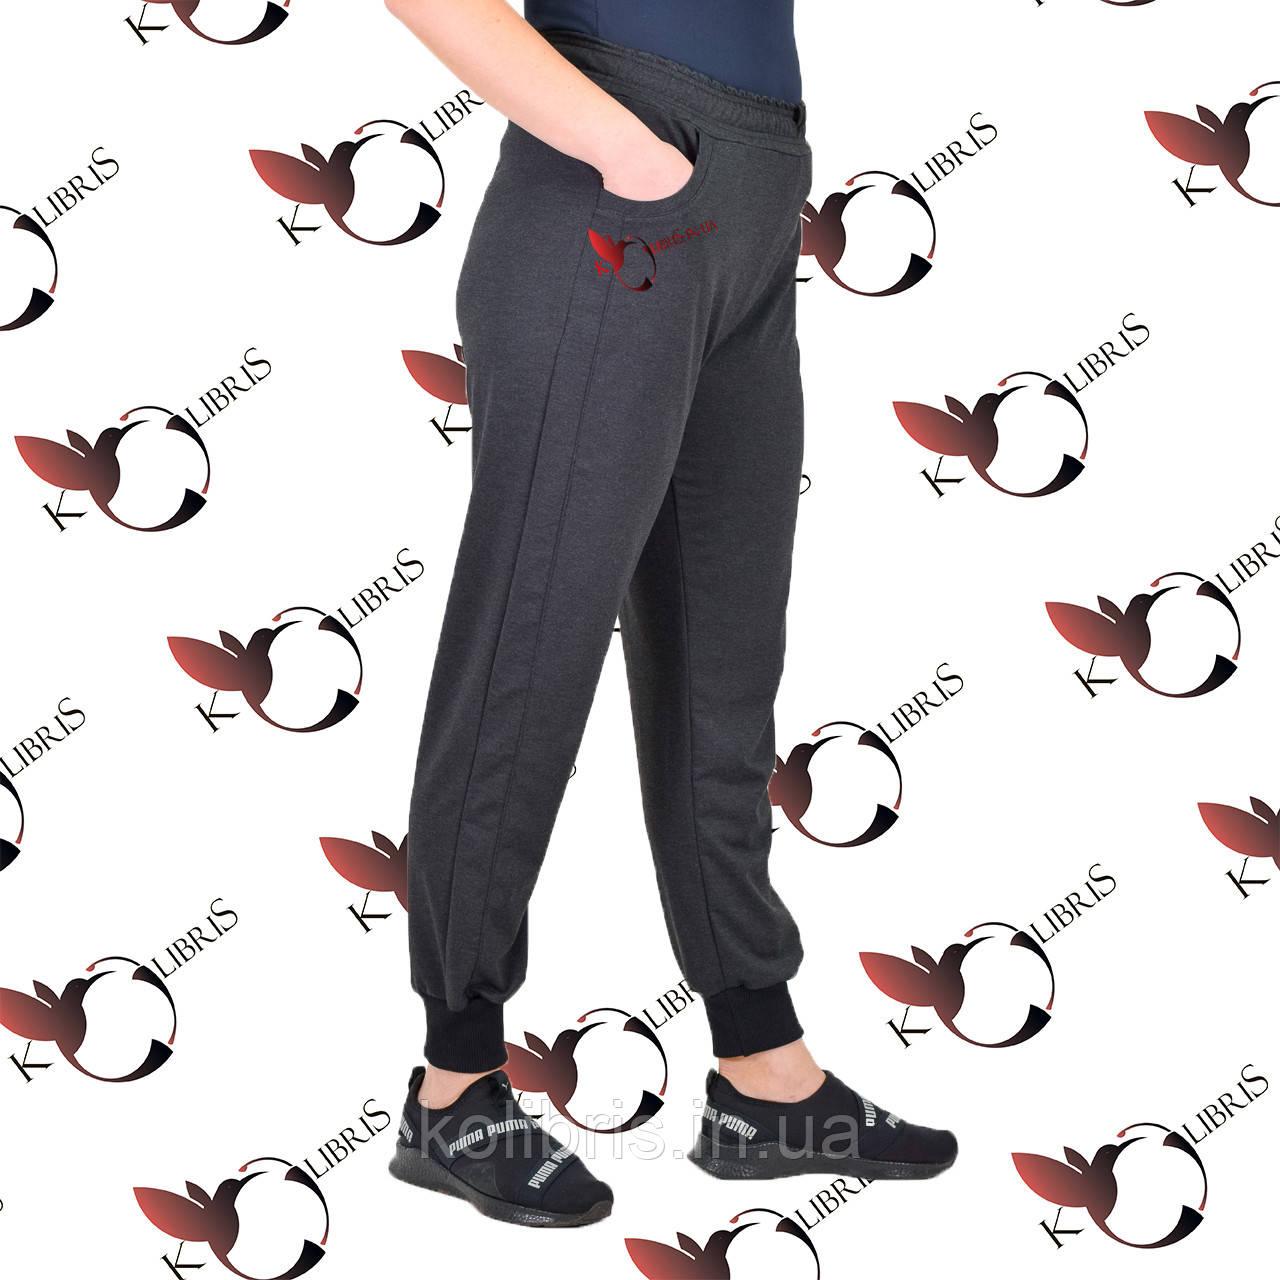 Женские брюки на манжете размеры от 50 до 58 двунитка серого цвета